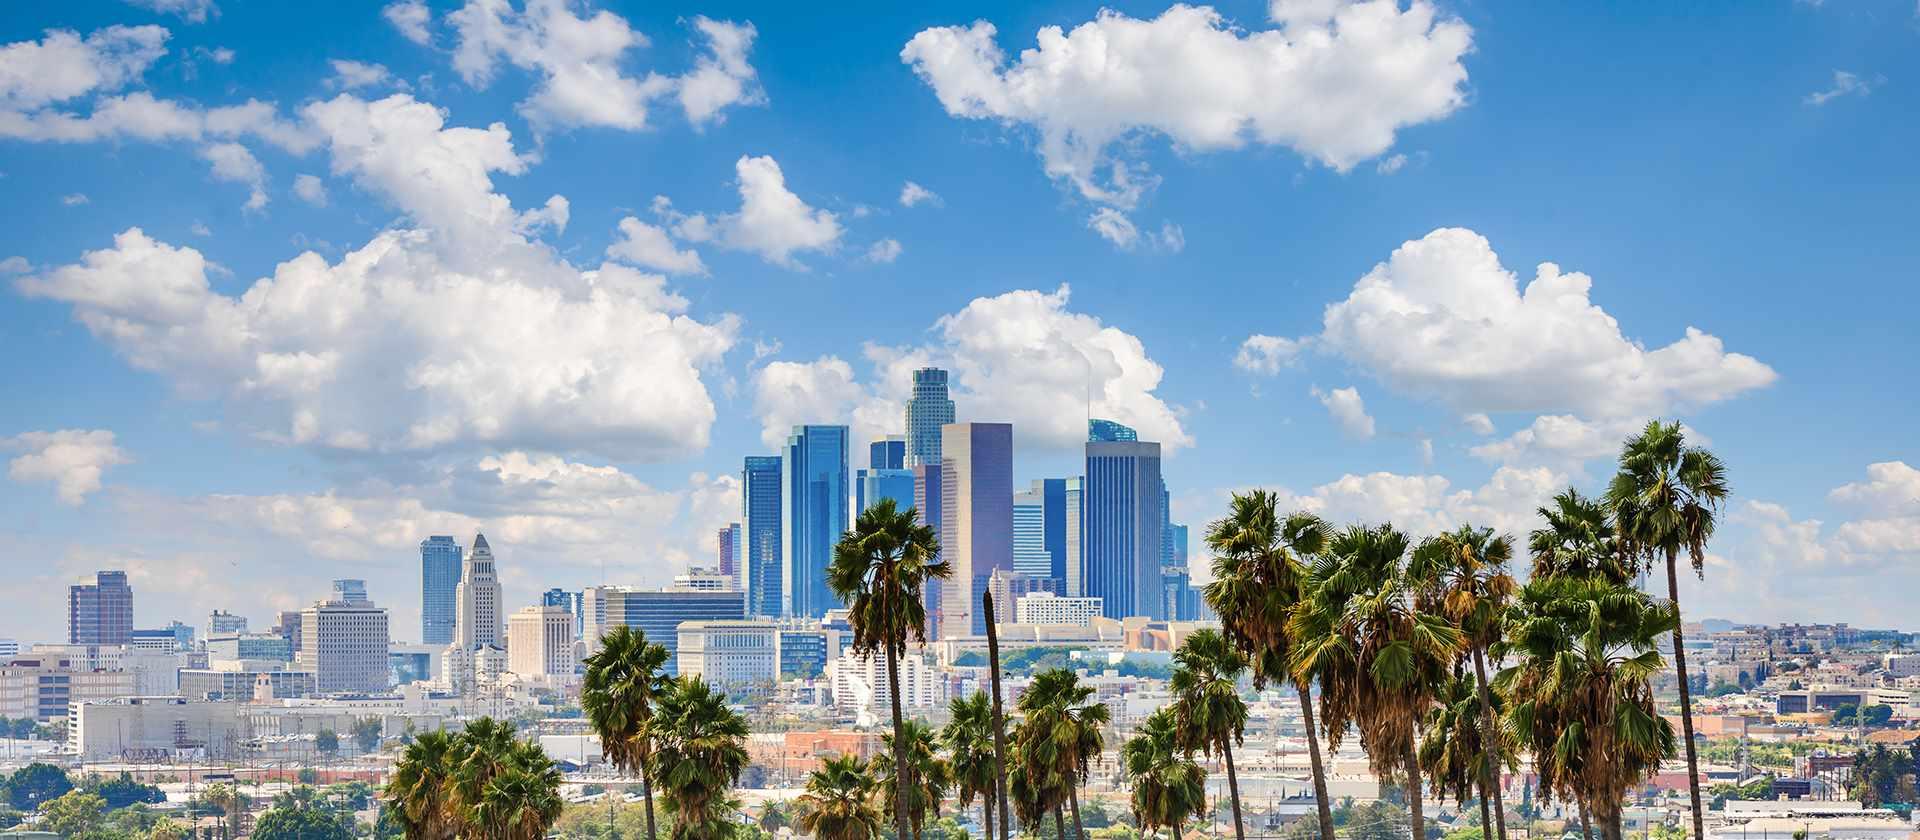 21th ISOLS General Meeting – Los Angeles 2022